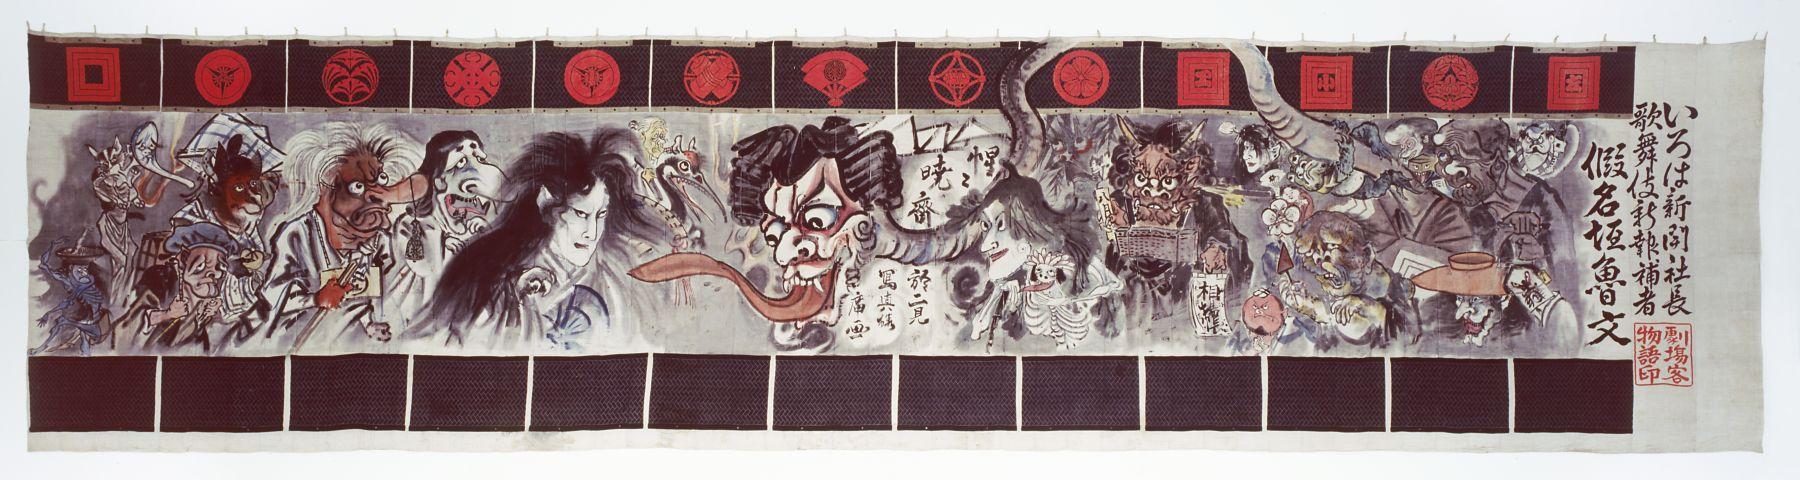 Japan Manga Exhibition at British Museum 017